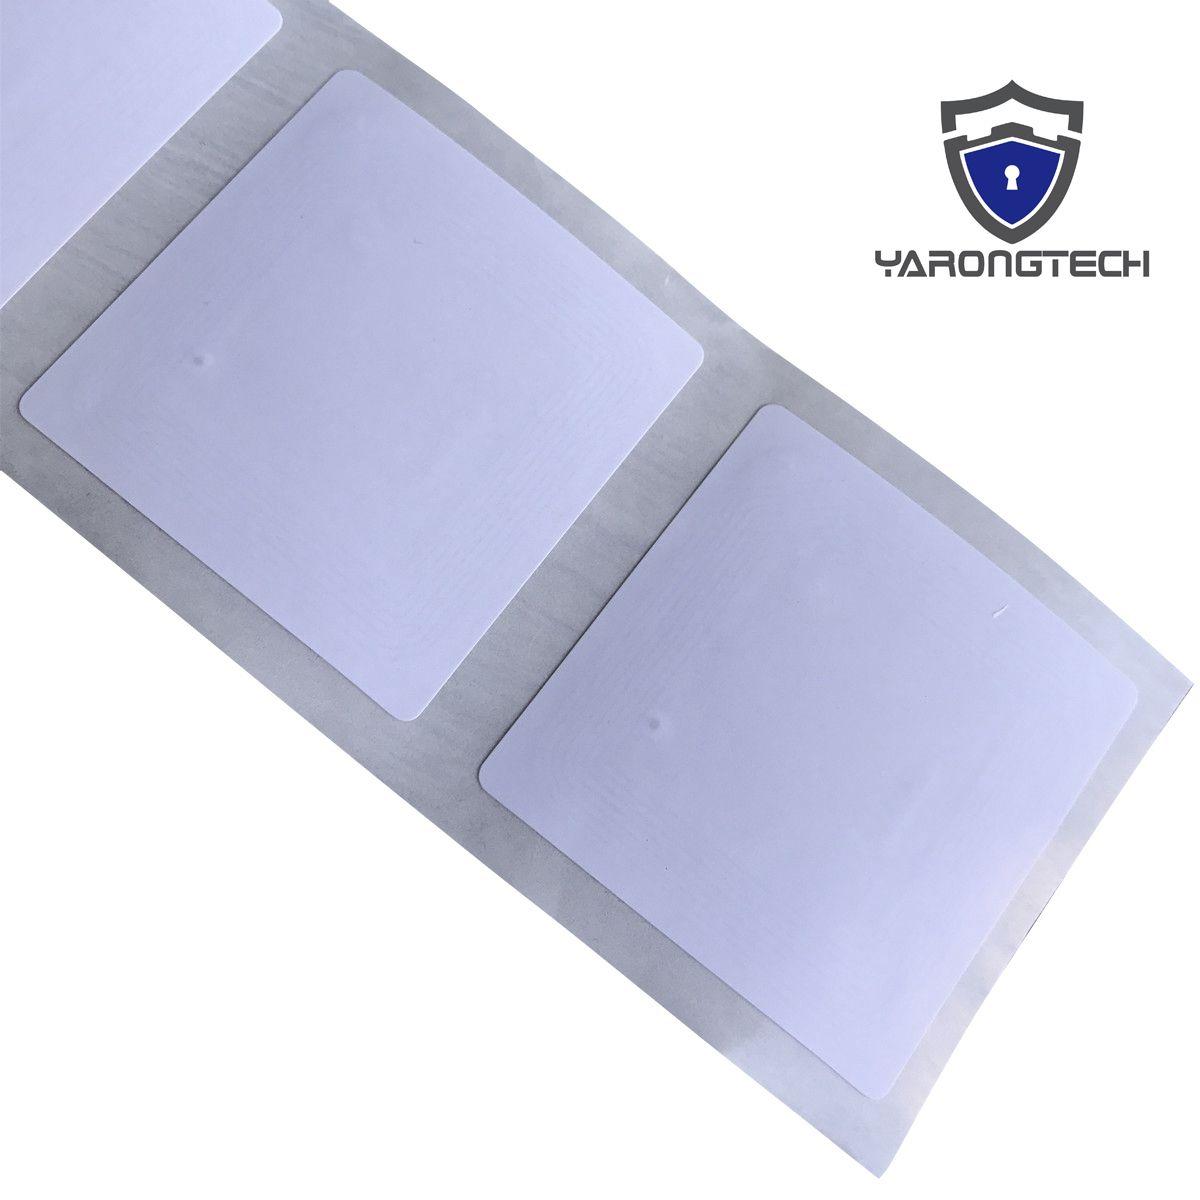 Etiquetas YARONGTECH ISO / IEC 15693 HF RFID Etiquetas de biblioteca de etiquetas de papel - NXP ICode SLIX (paquete de 20)